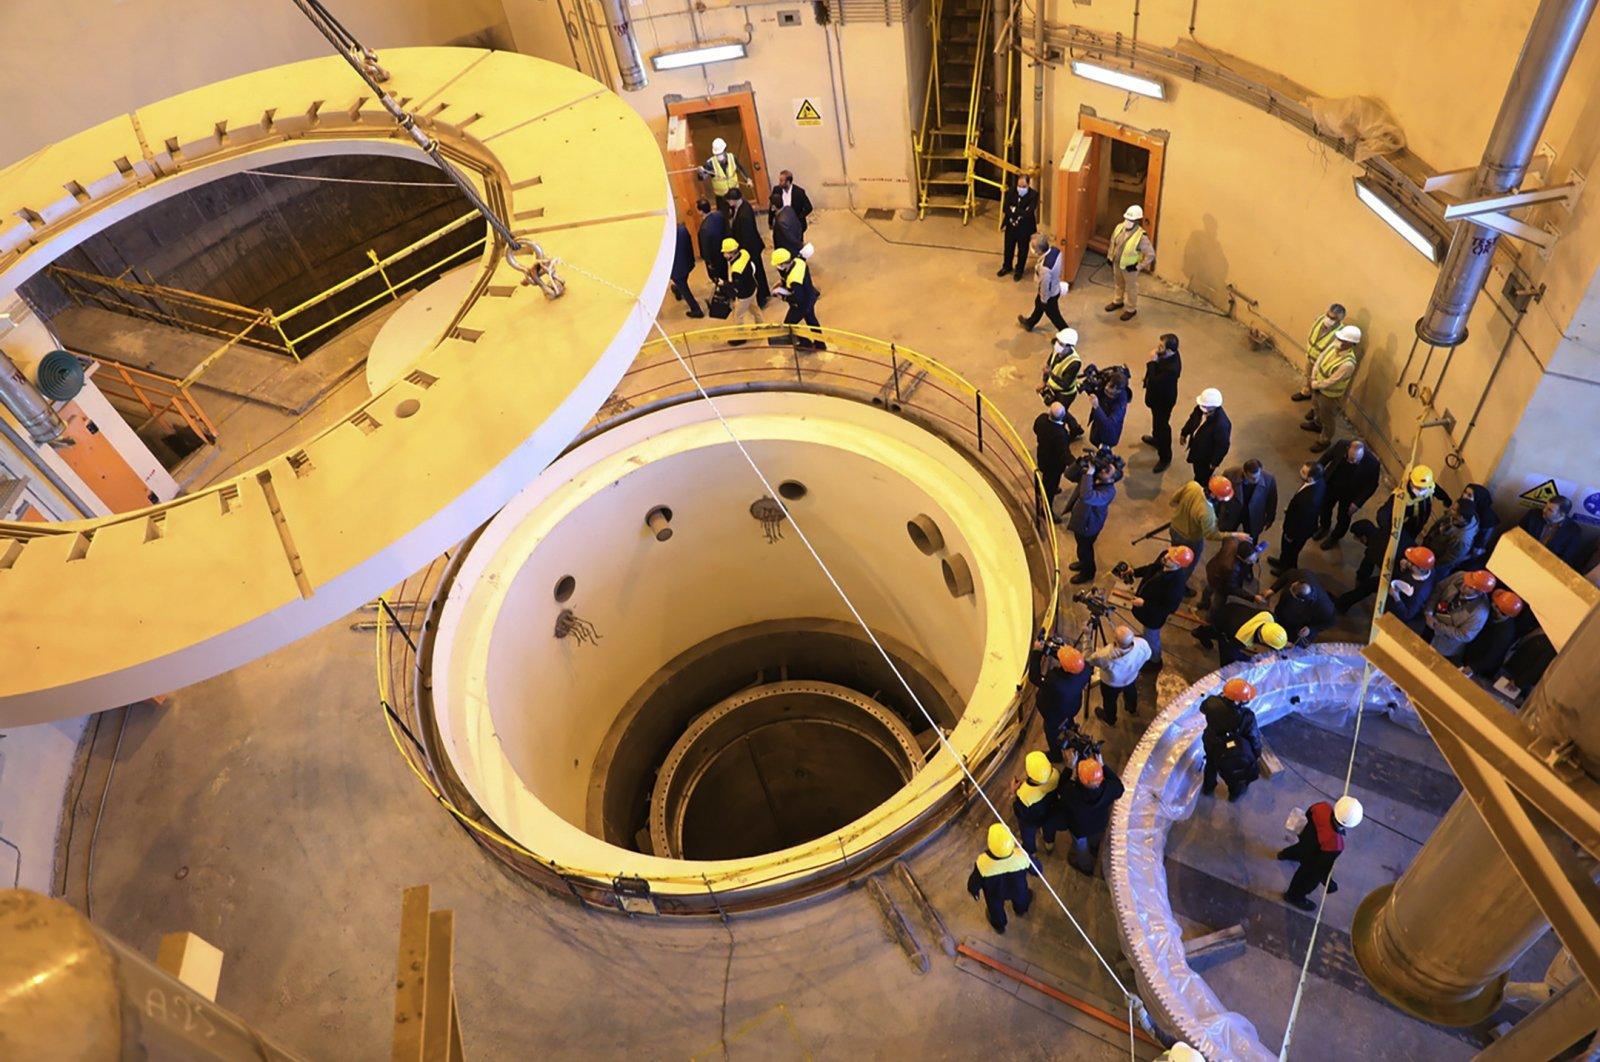 Technicians at the Arak heavy water reactor's secondary circuit, show officials and media around the site, near Arak, 250 kilometers (150 miles) southwest of the capital Tehran, Iran, Dec. 23, 2019. (Atomic Energy Organization of Iran via AP)